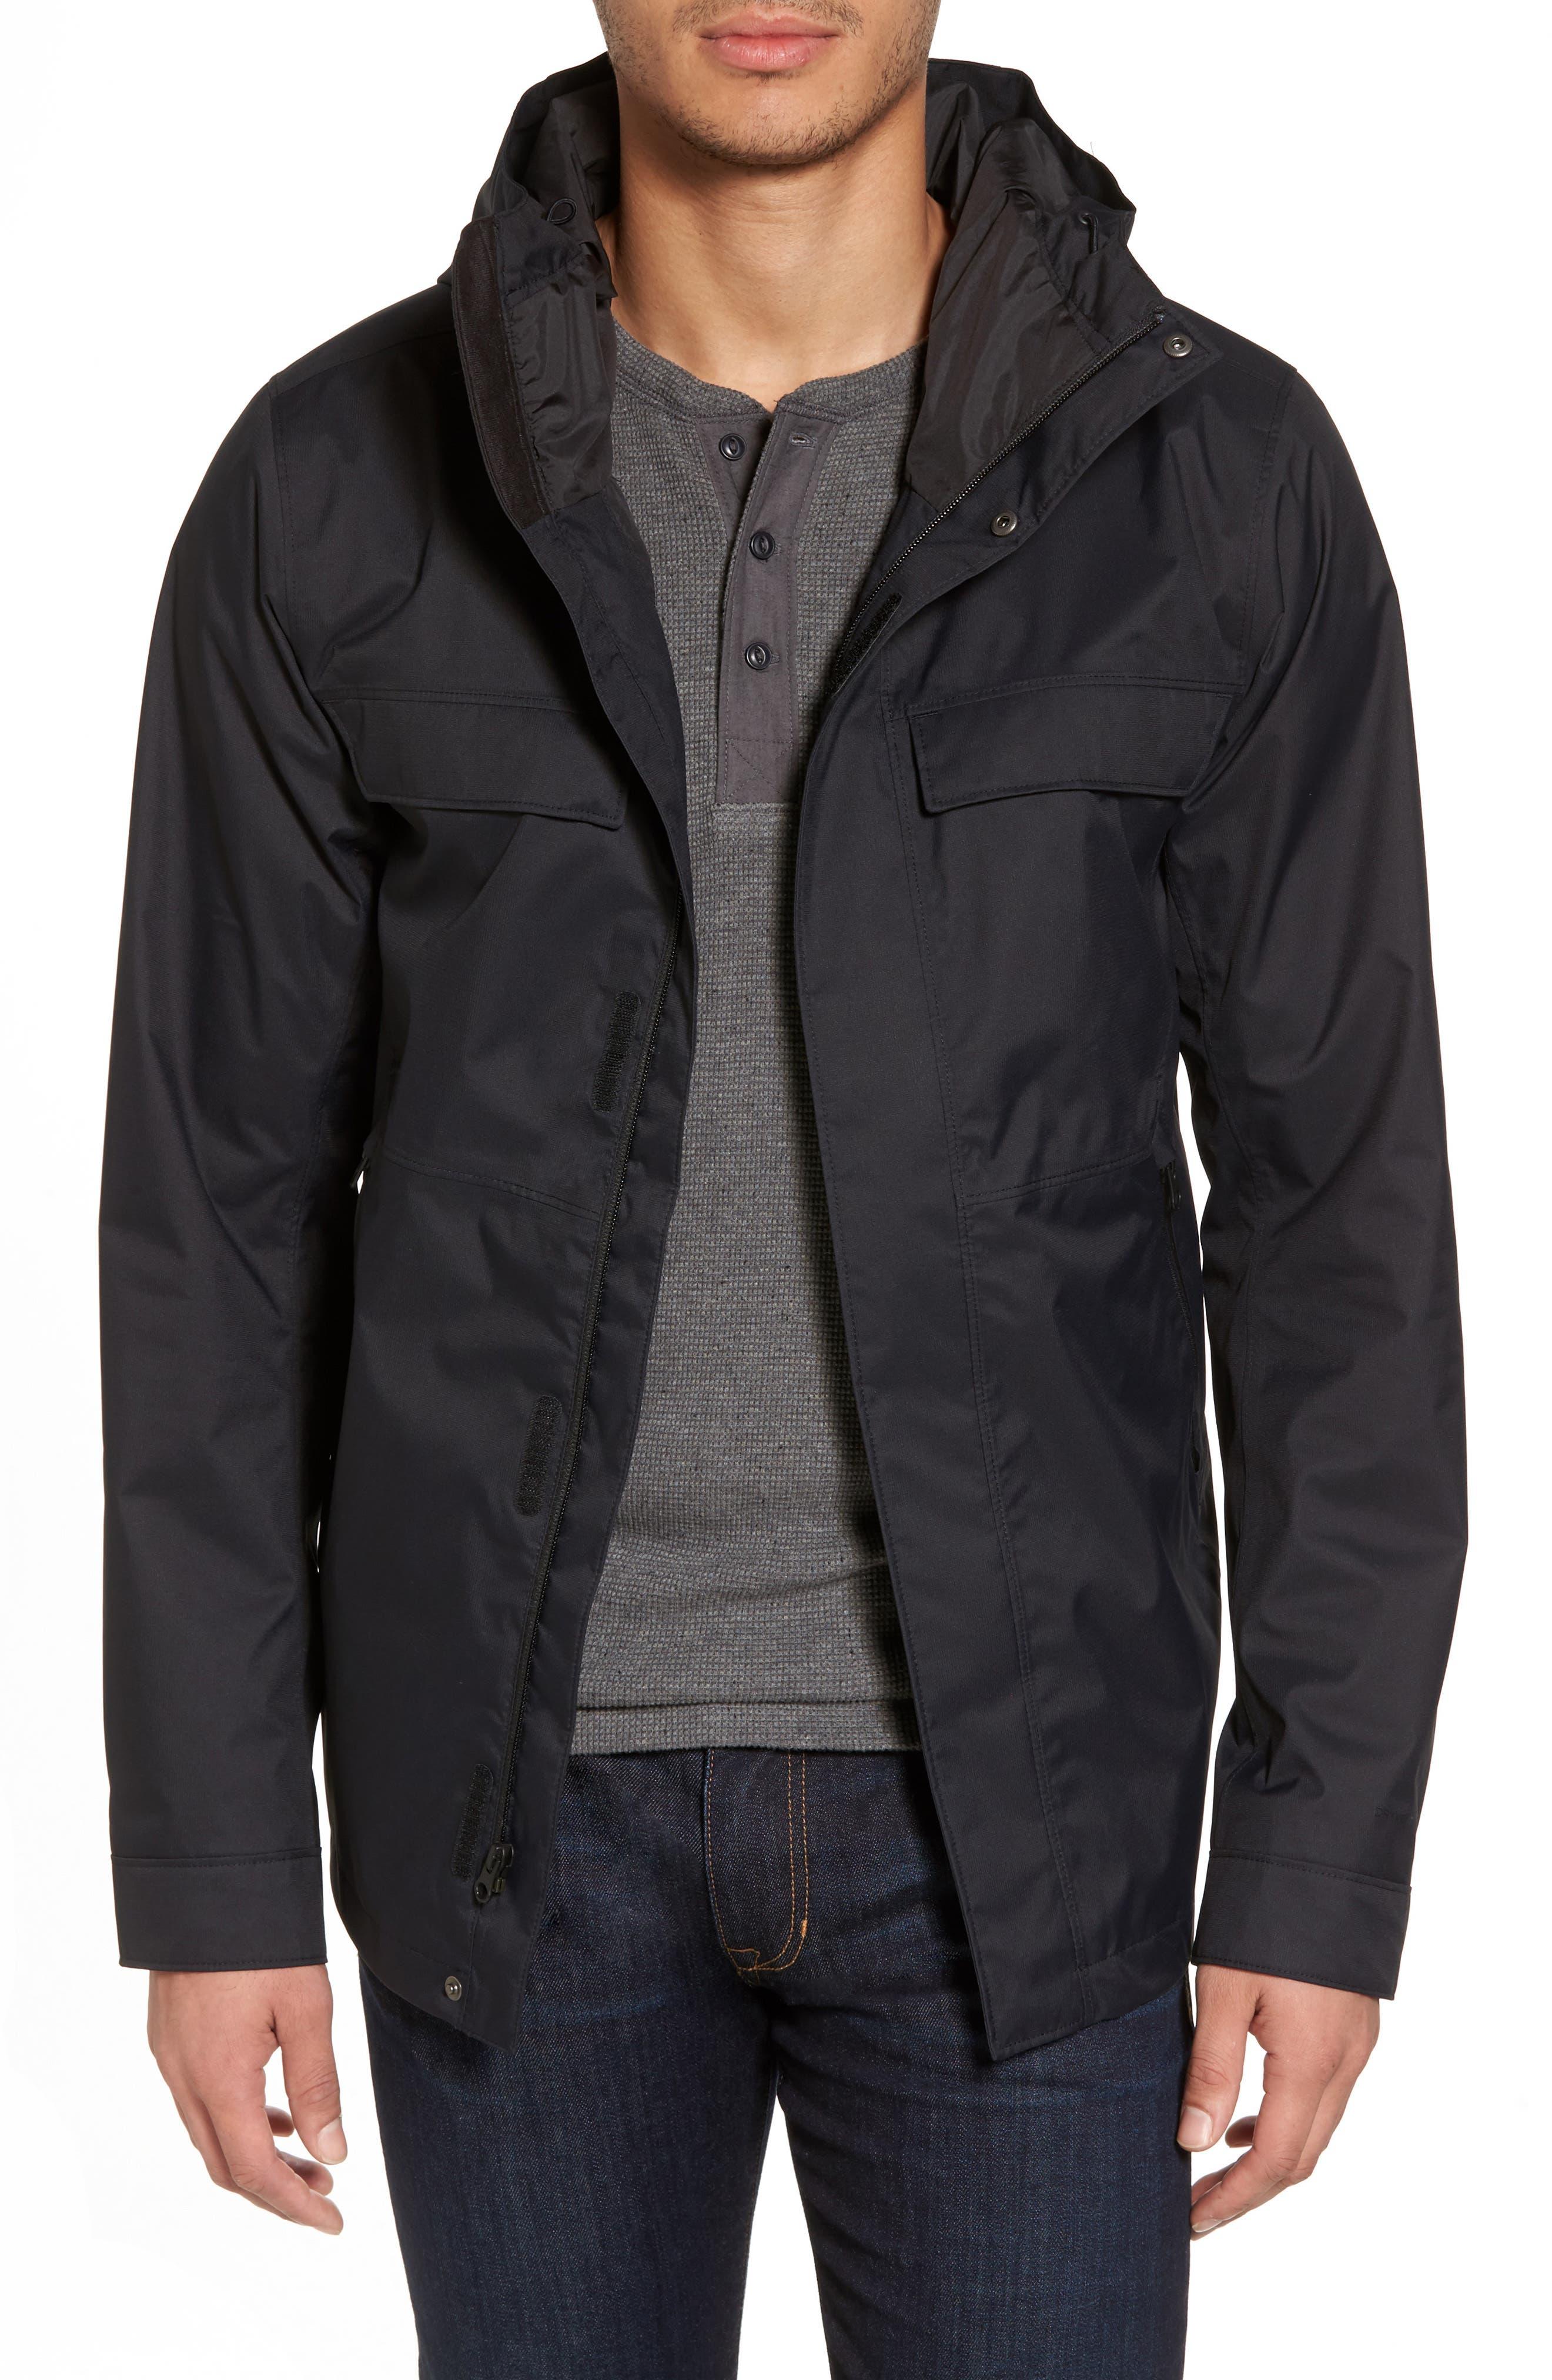 Jenison II Insulated Waterproof Jacket,                             Main thumbnail 1, color,                             Tnf Black